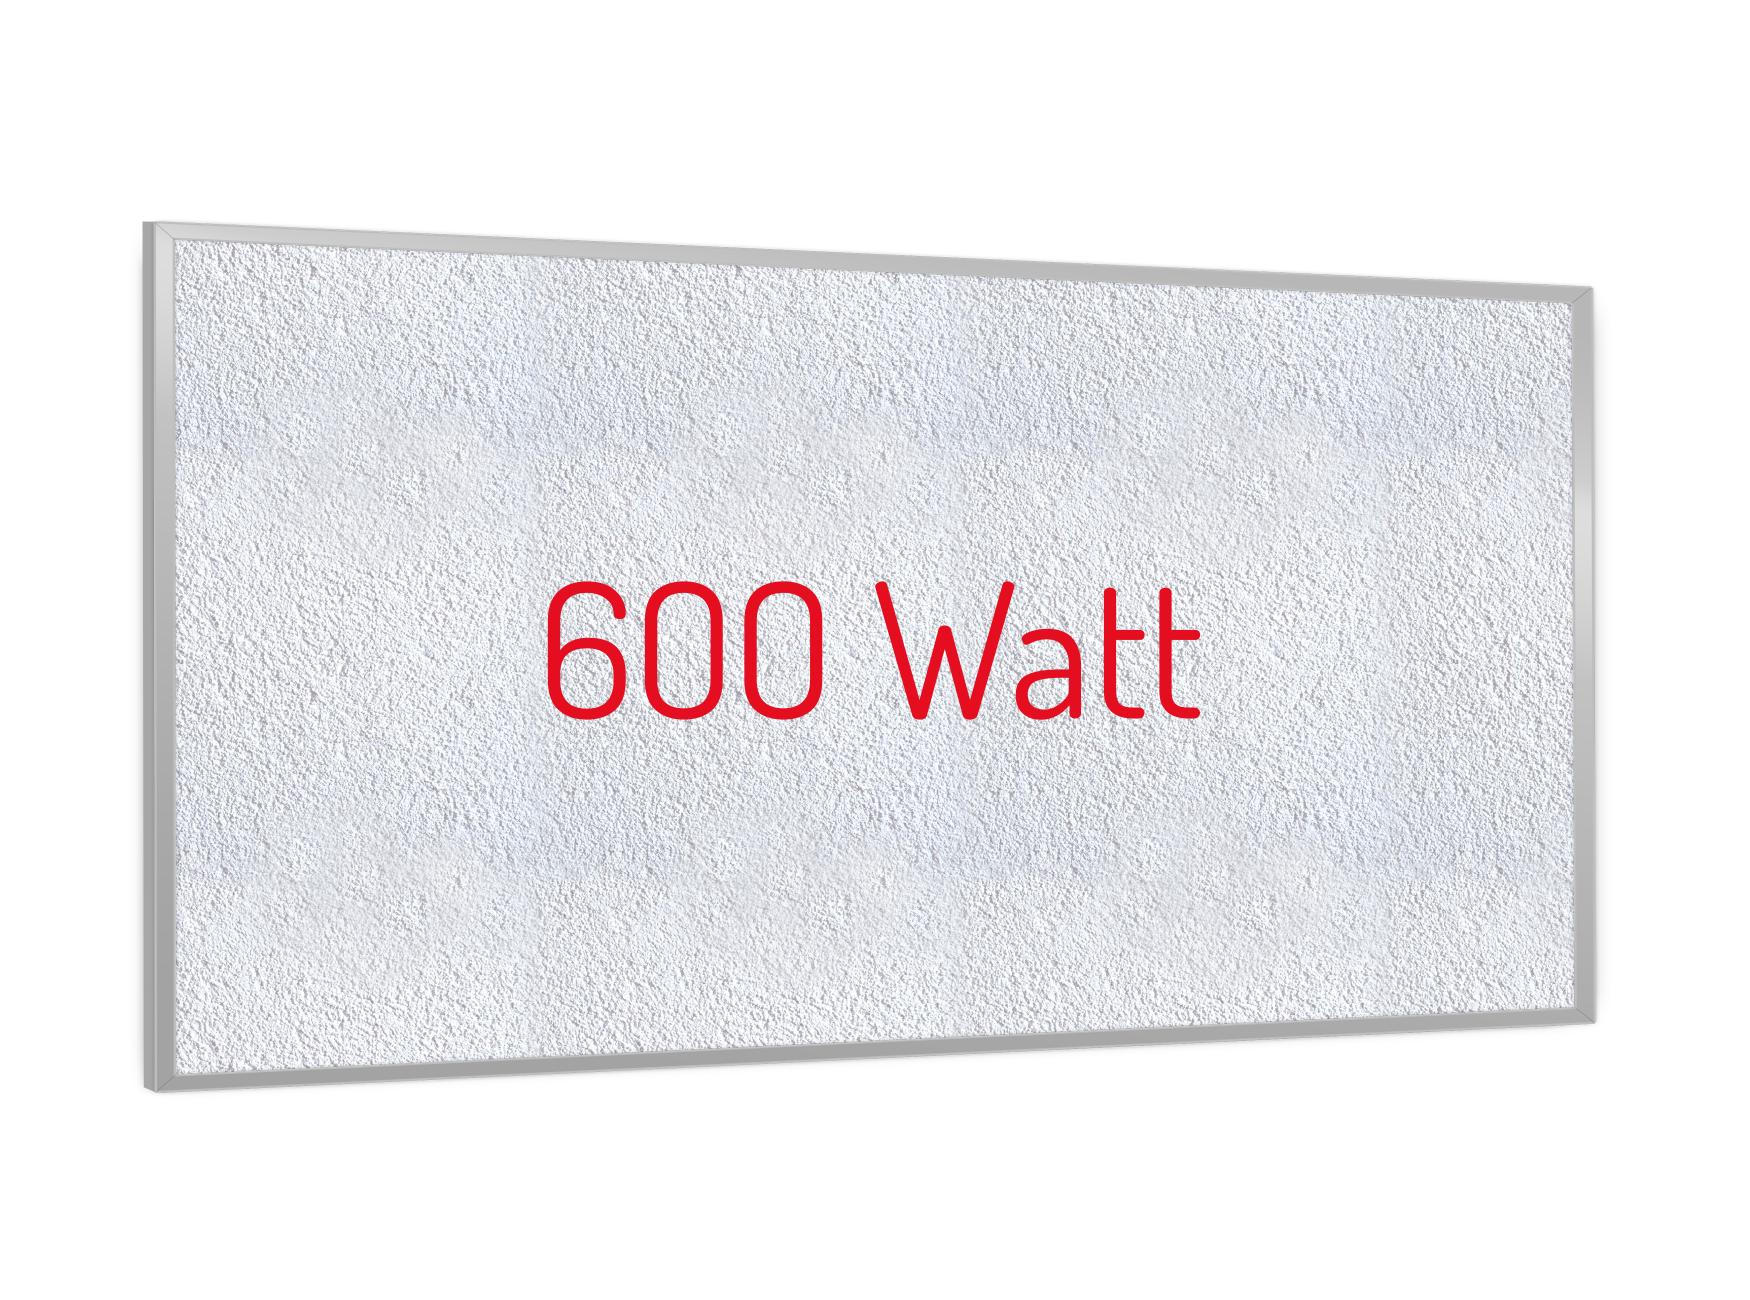 PowerSun Reflex 600 Watt 50x100cm